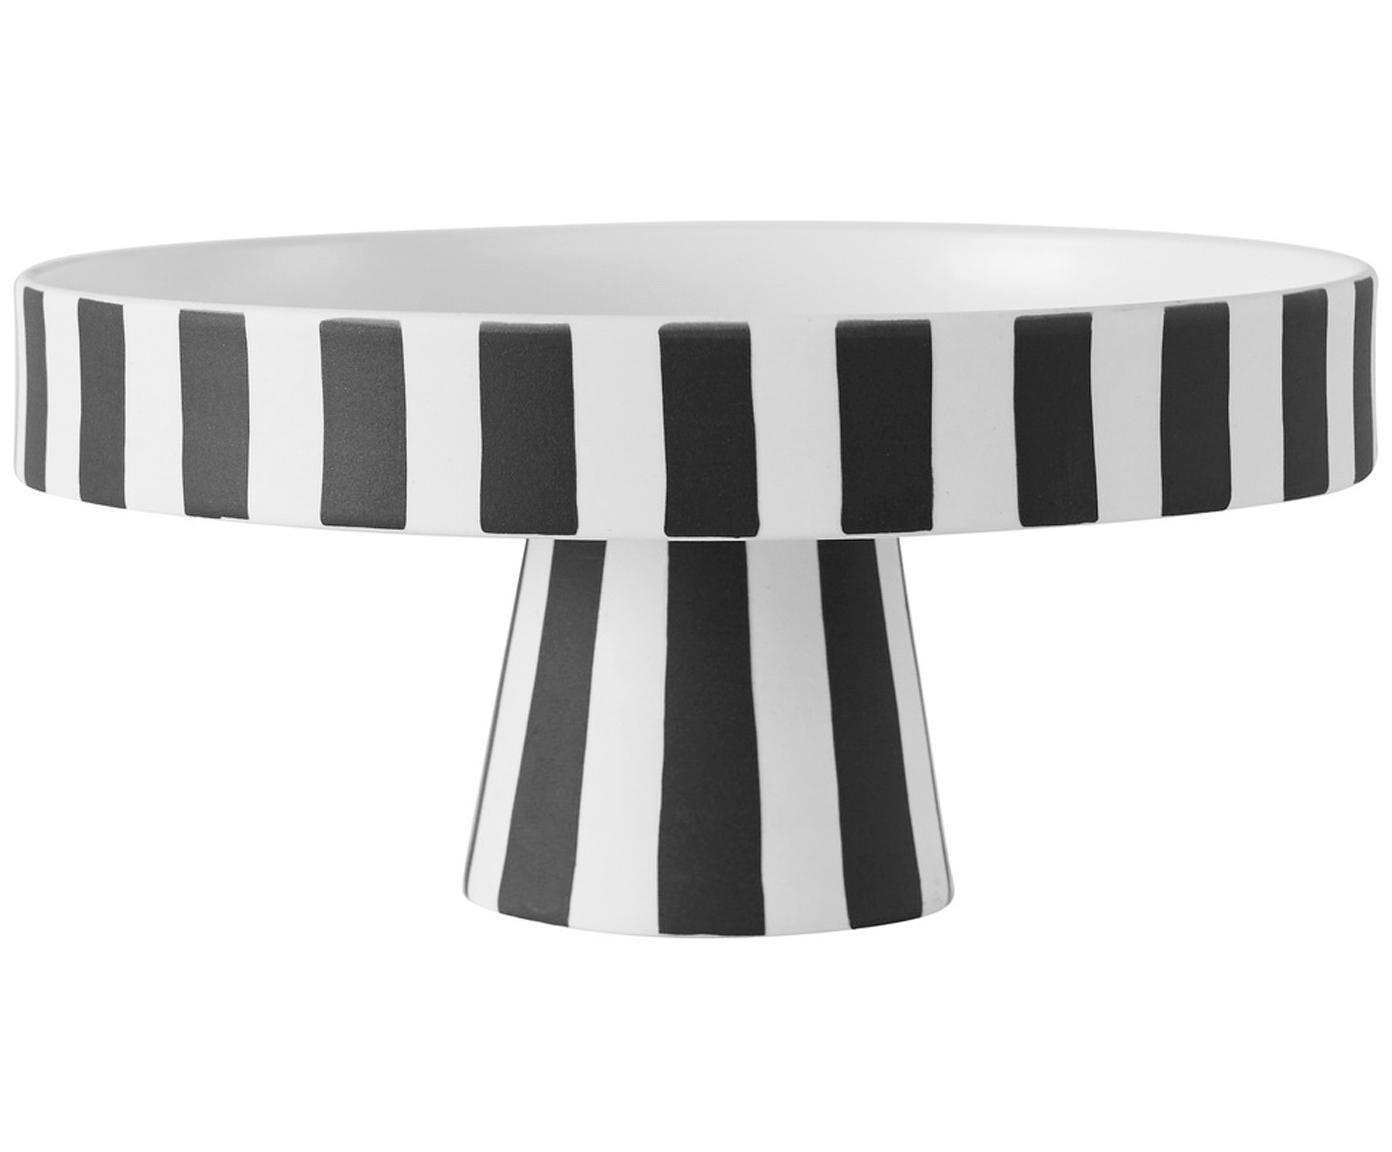 Fuente para postre Toppu, Cerámica, Blanco, negro, Ø 20 x Al 9 cm